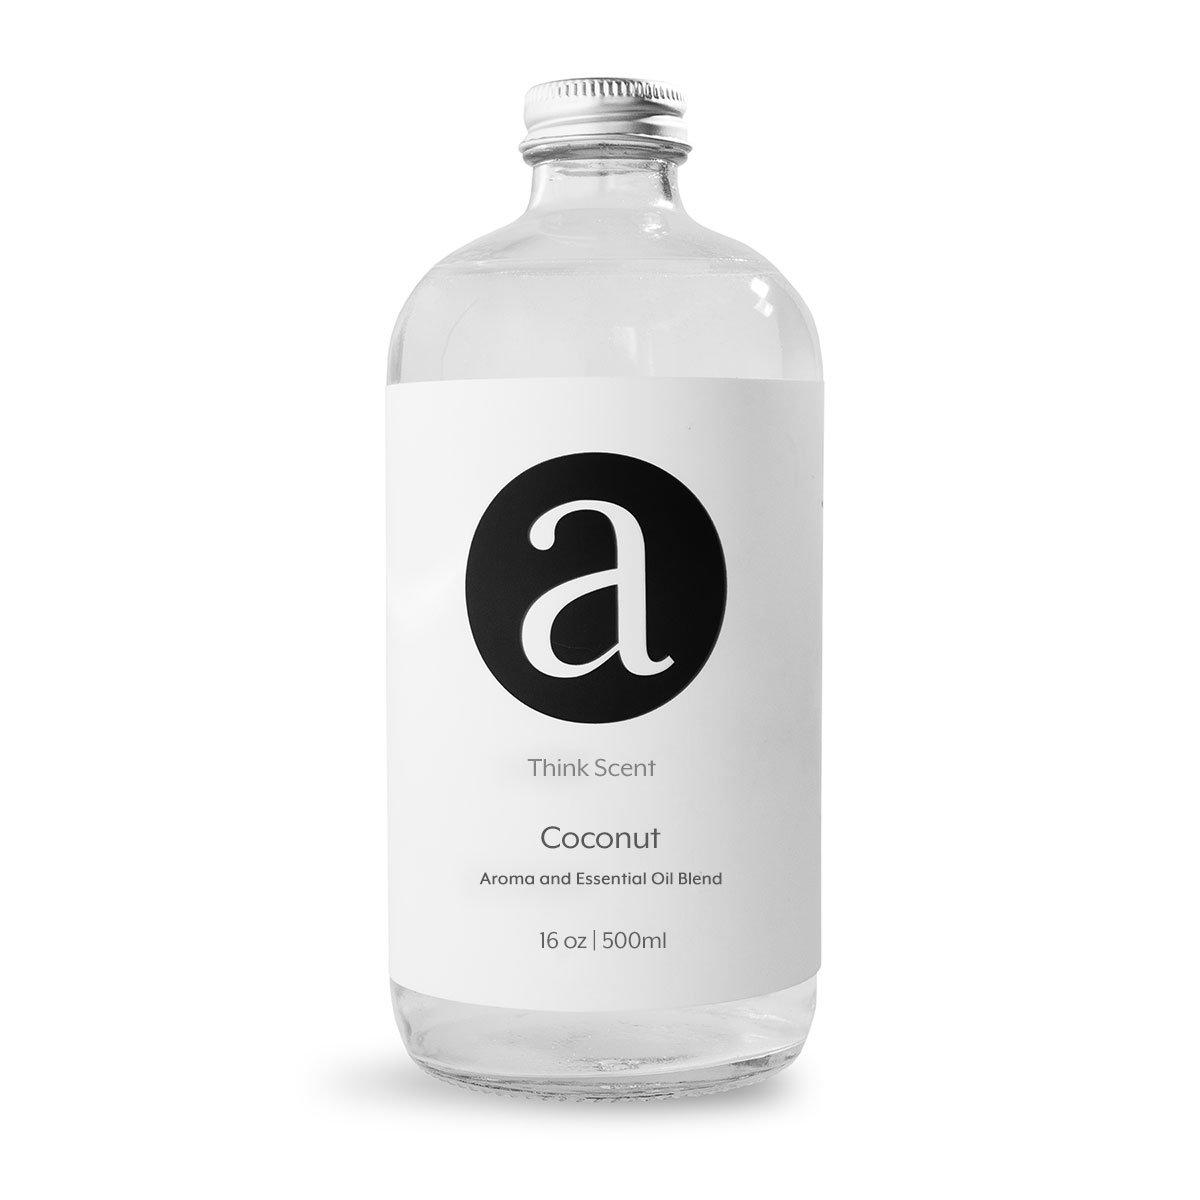 (Coconut) Aroma / Fragrance Oil For AromaTech Air Freshener Scent Diffuser (500ml)